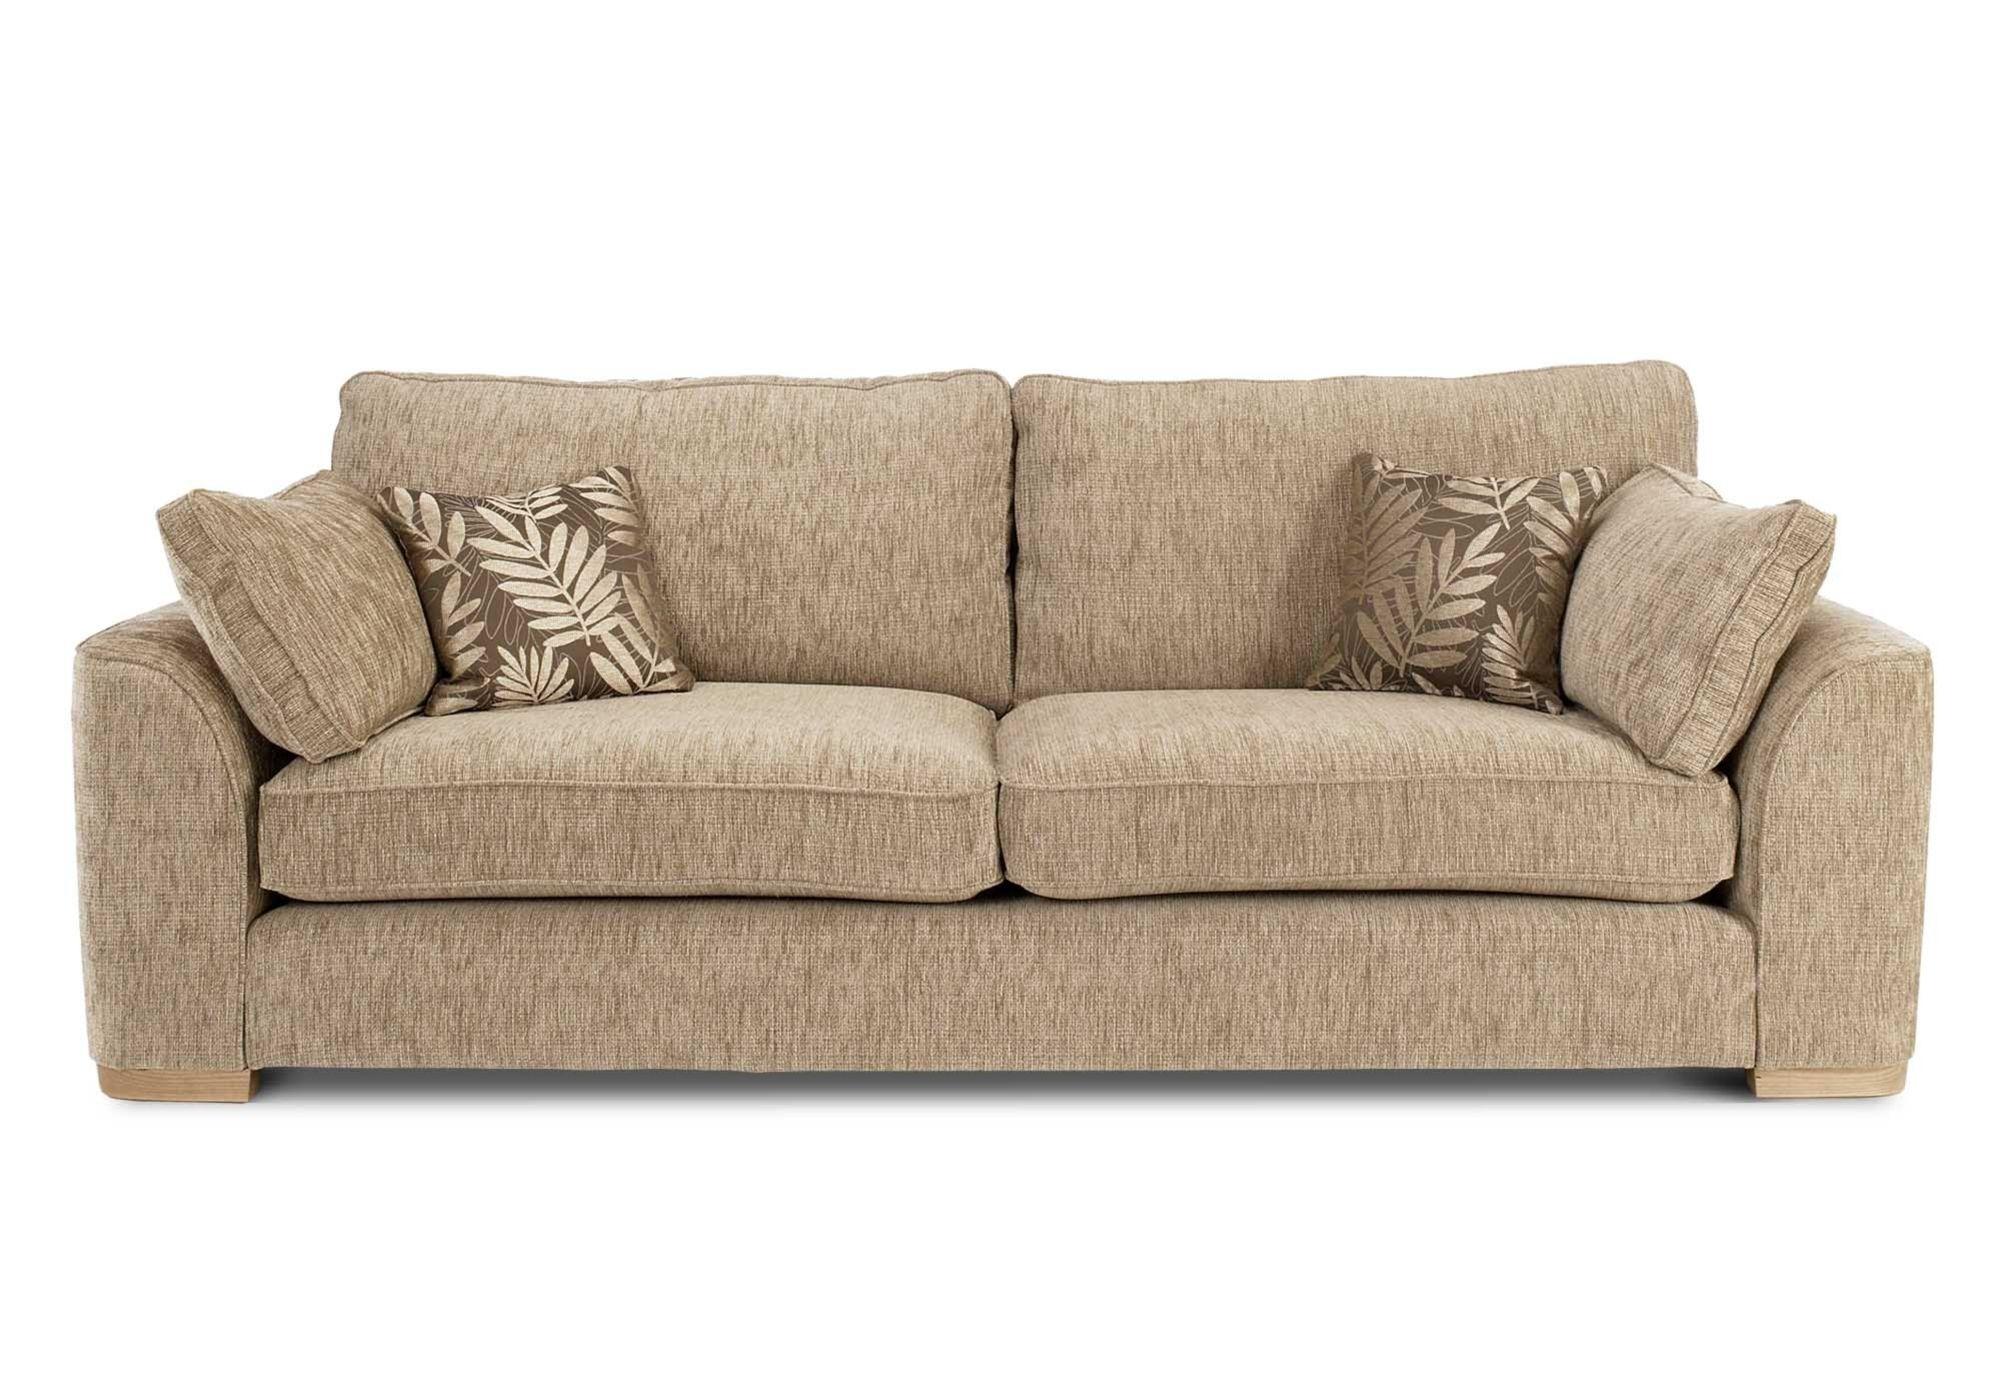 4 seater classic back sofa Lonsdale Sofa Sets